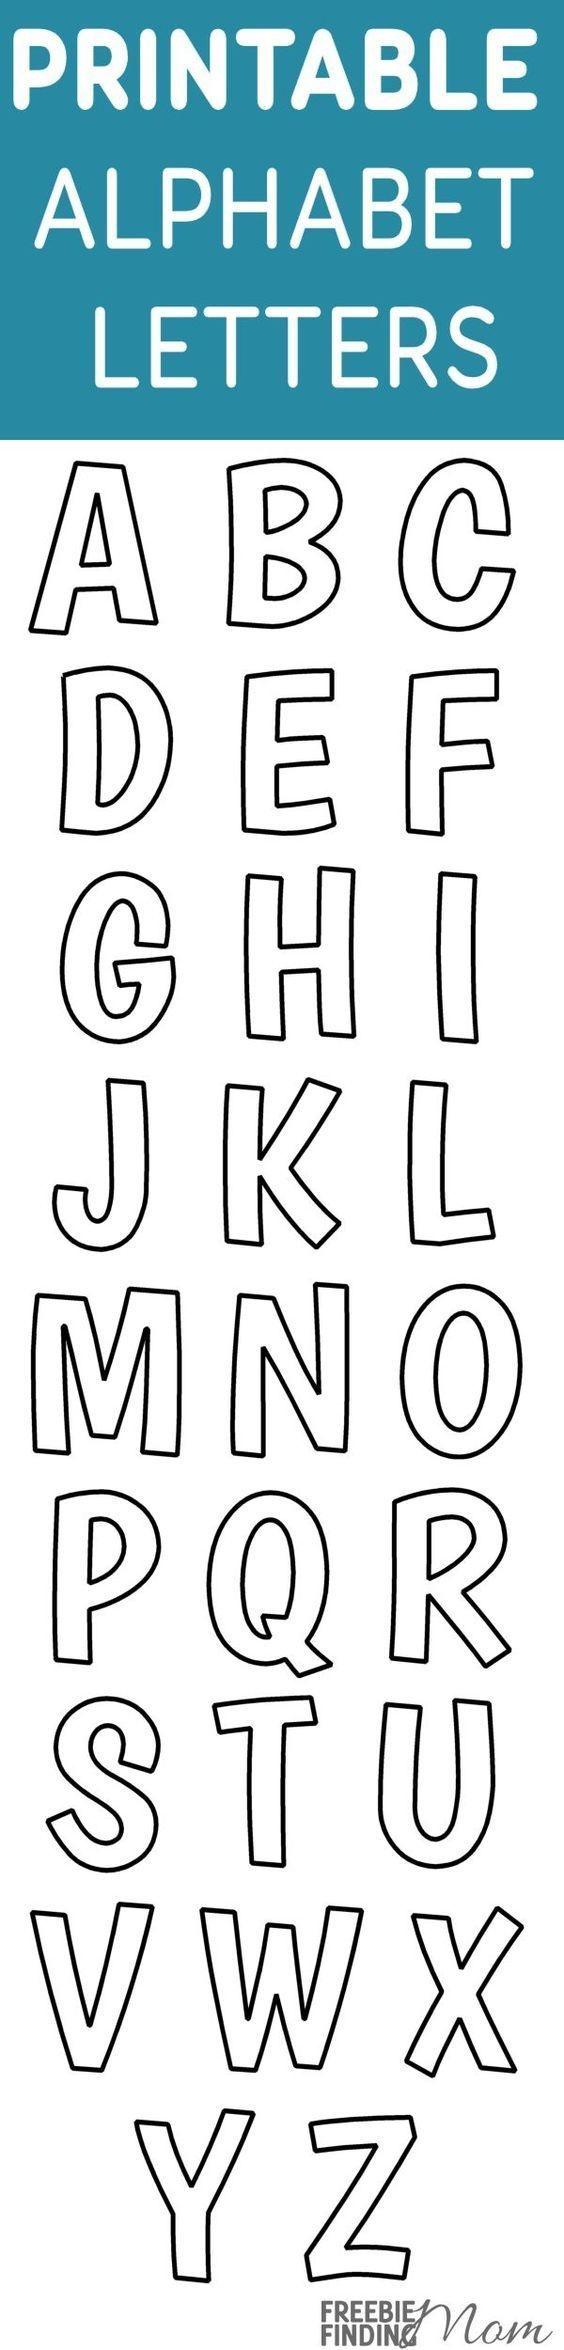 Printable Free Alphabet Templates | The Group Board On Pinterest - Free Printable Alphabet Stencils Templates